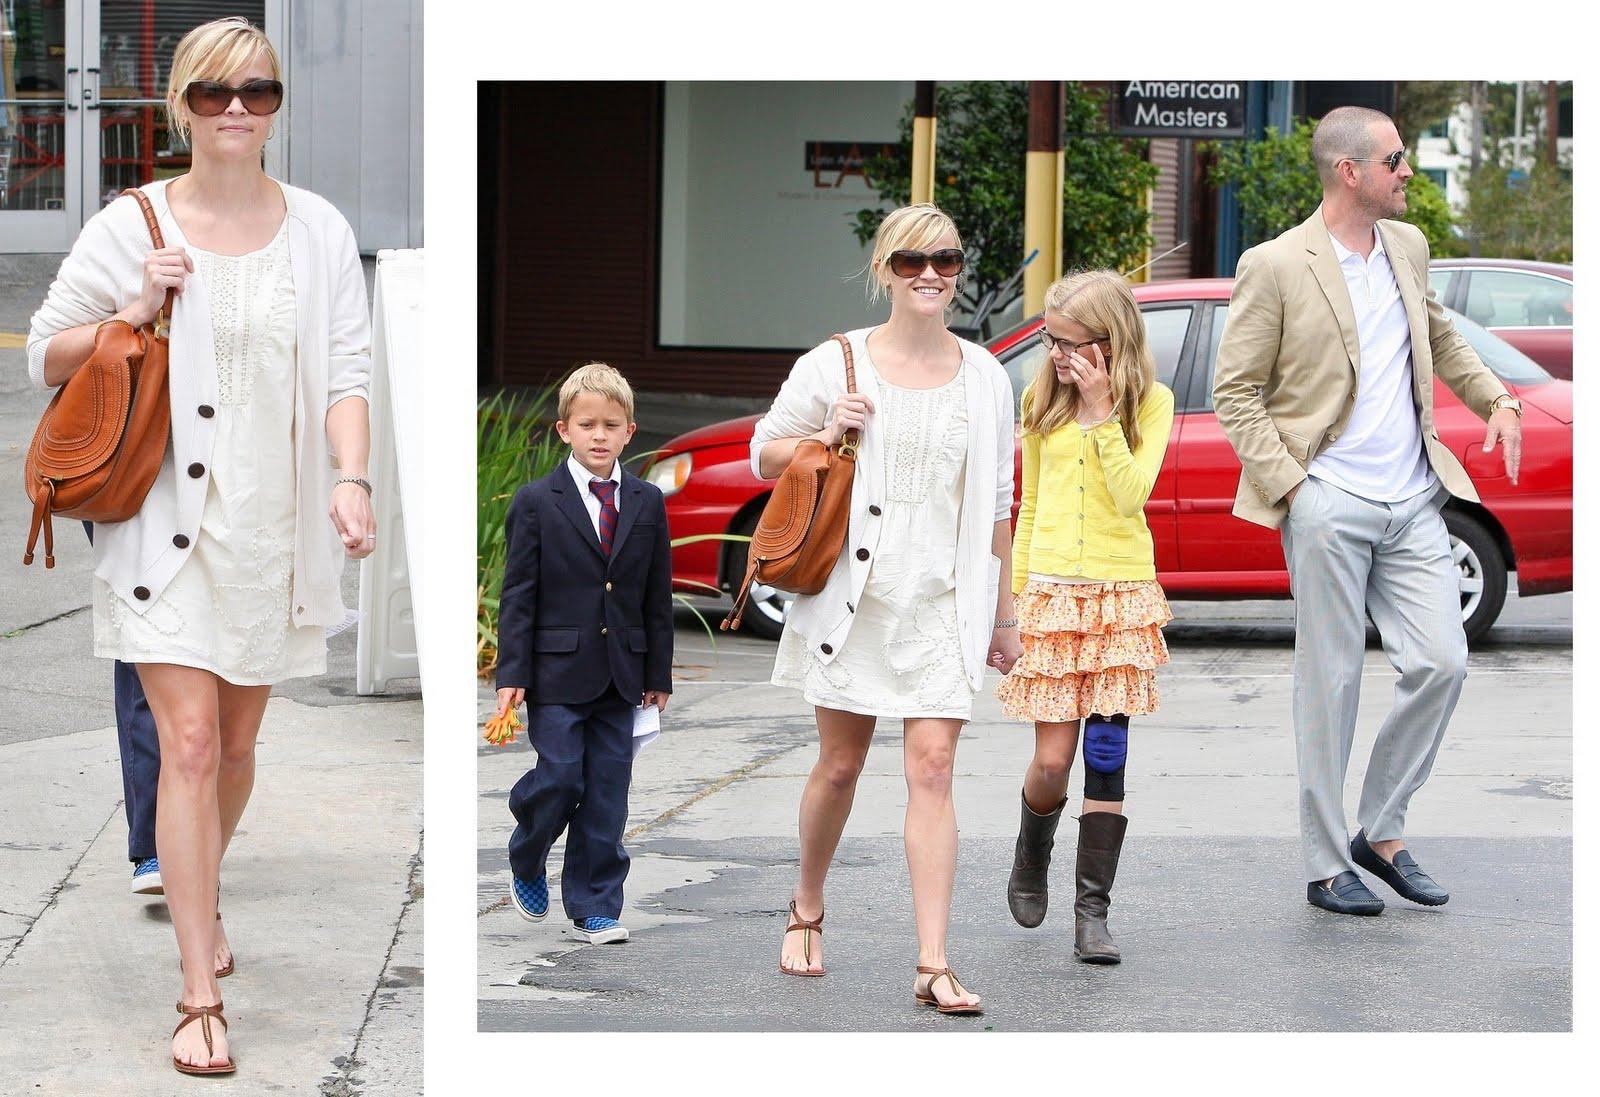 http://2.bp.blogspot.com/-K4cIpzNEPSc/TbZQwdFTBTI/AAAAAAAAFqk/XtsfjyCwi_w/s1600/Reese+Witherspoon+Sandals+on+Easter.jpg